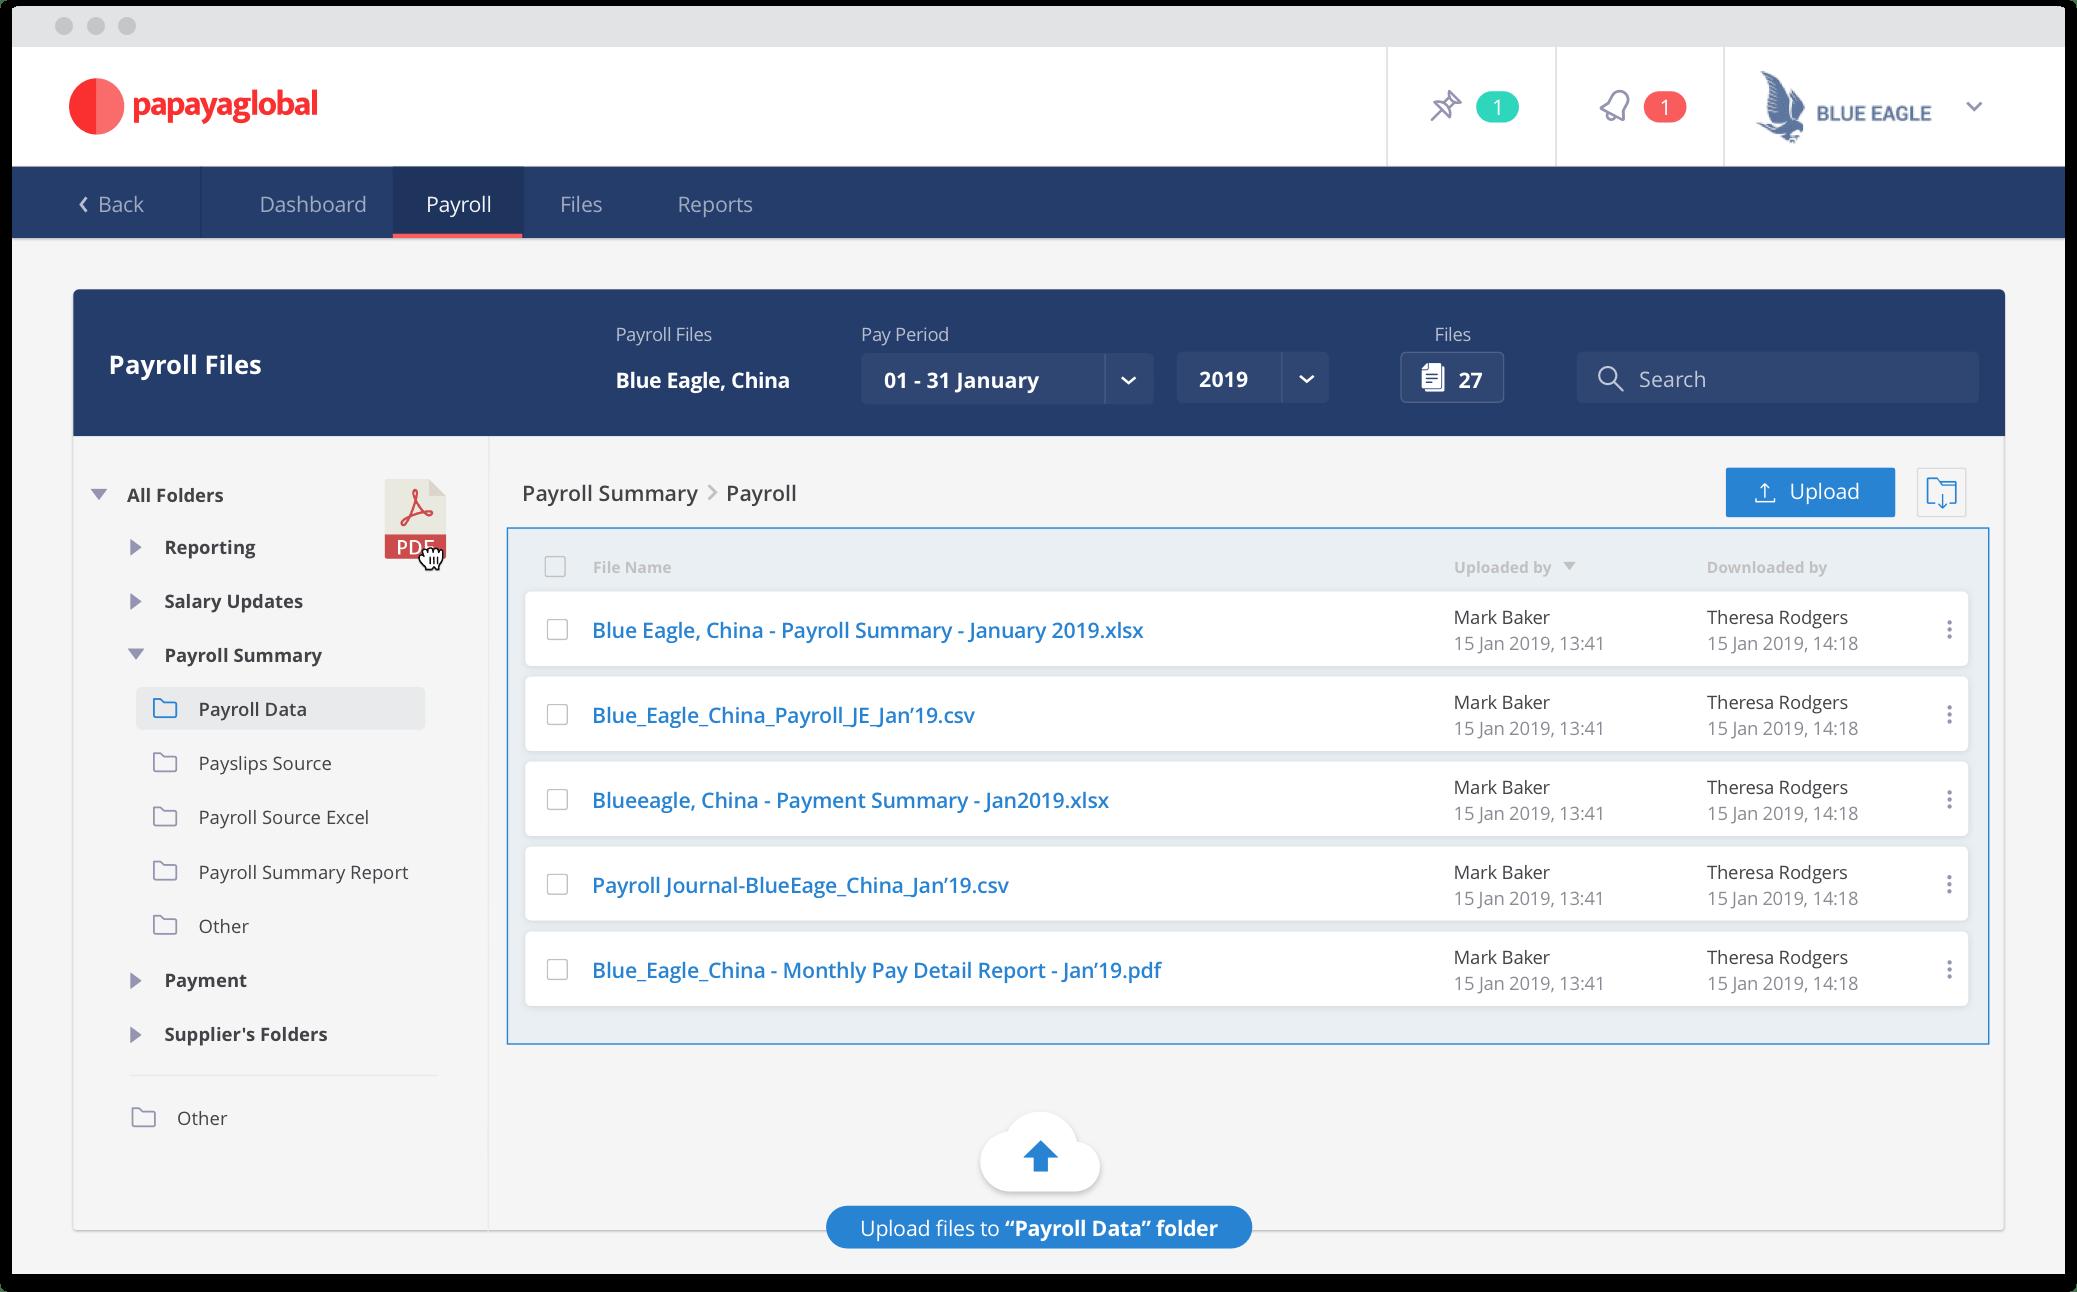 Papaya Global - Payroll Data